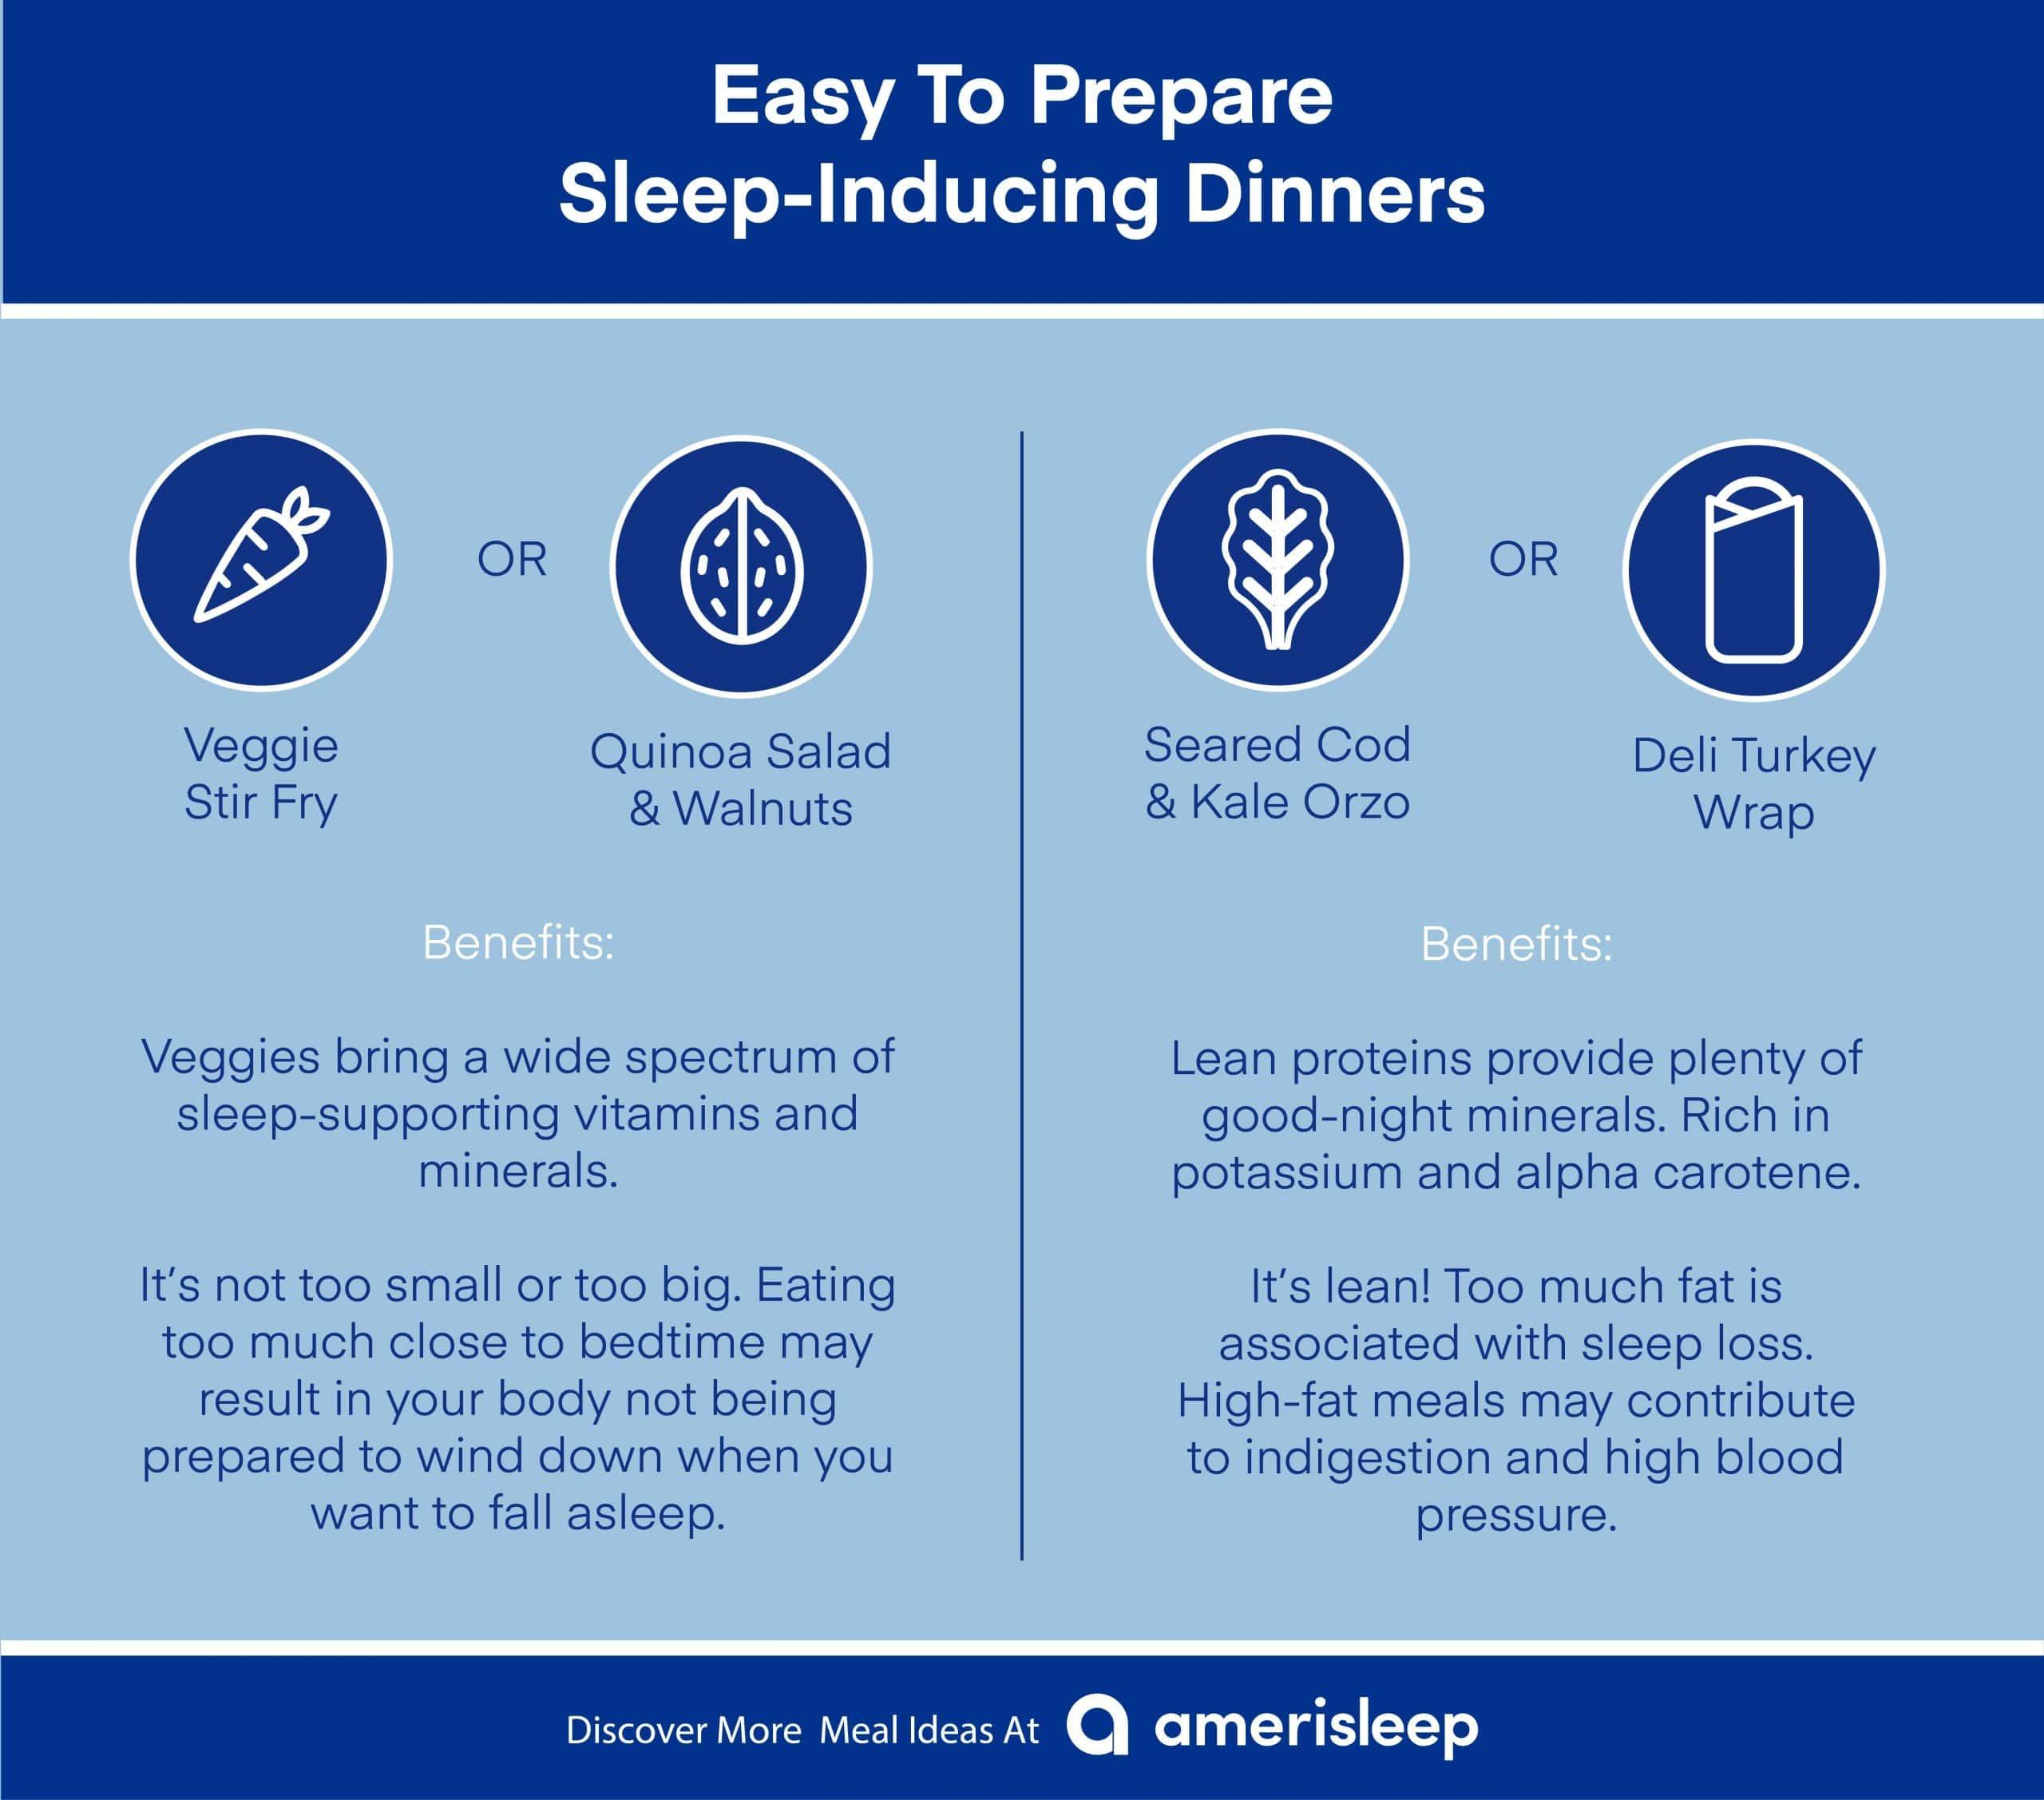 Sleep-Inducing Dinners